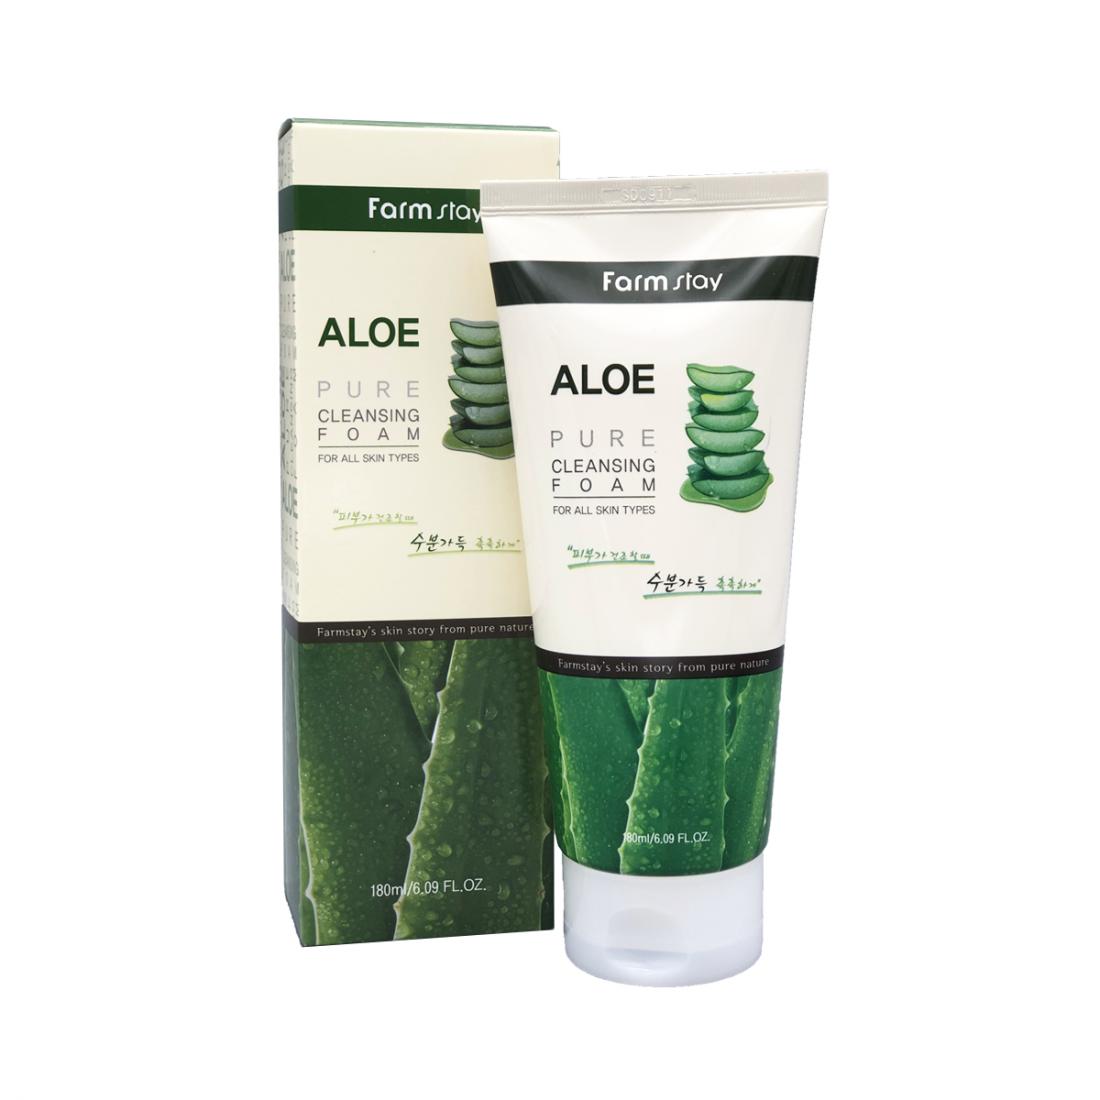 Пенка для умывания с экстрактом алоэ Aloe Pure Cleansing Foam